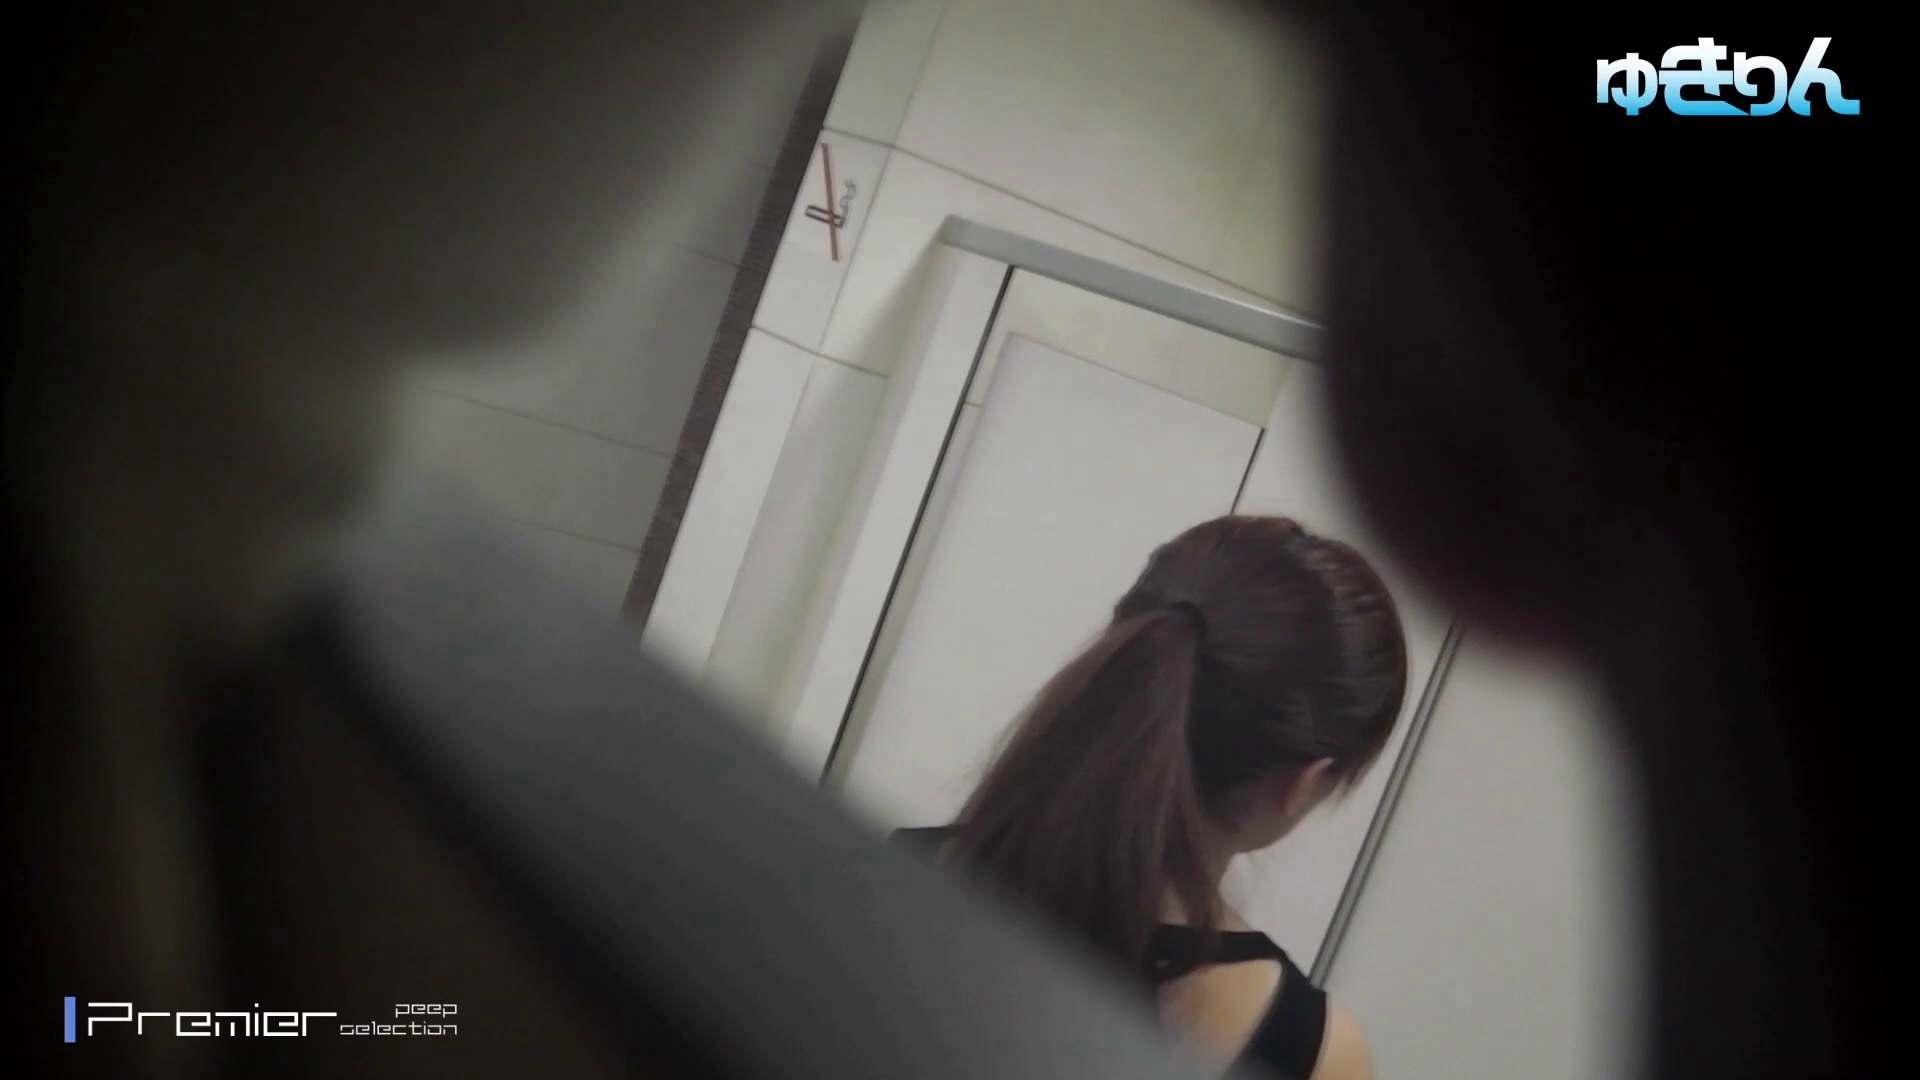 cm友達同士三人グループの二人を同時に捕獲【新世界の射窓からNo120】 むっちり セックス無修正動画無料 92画像 87